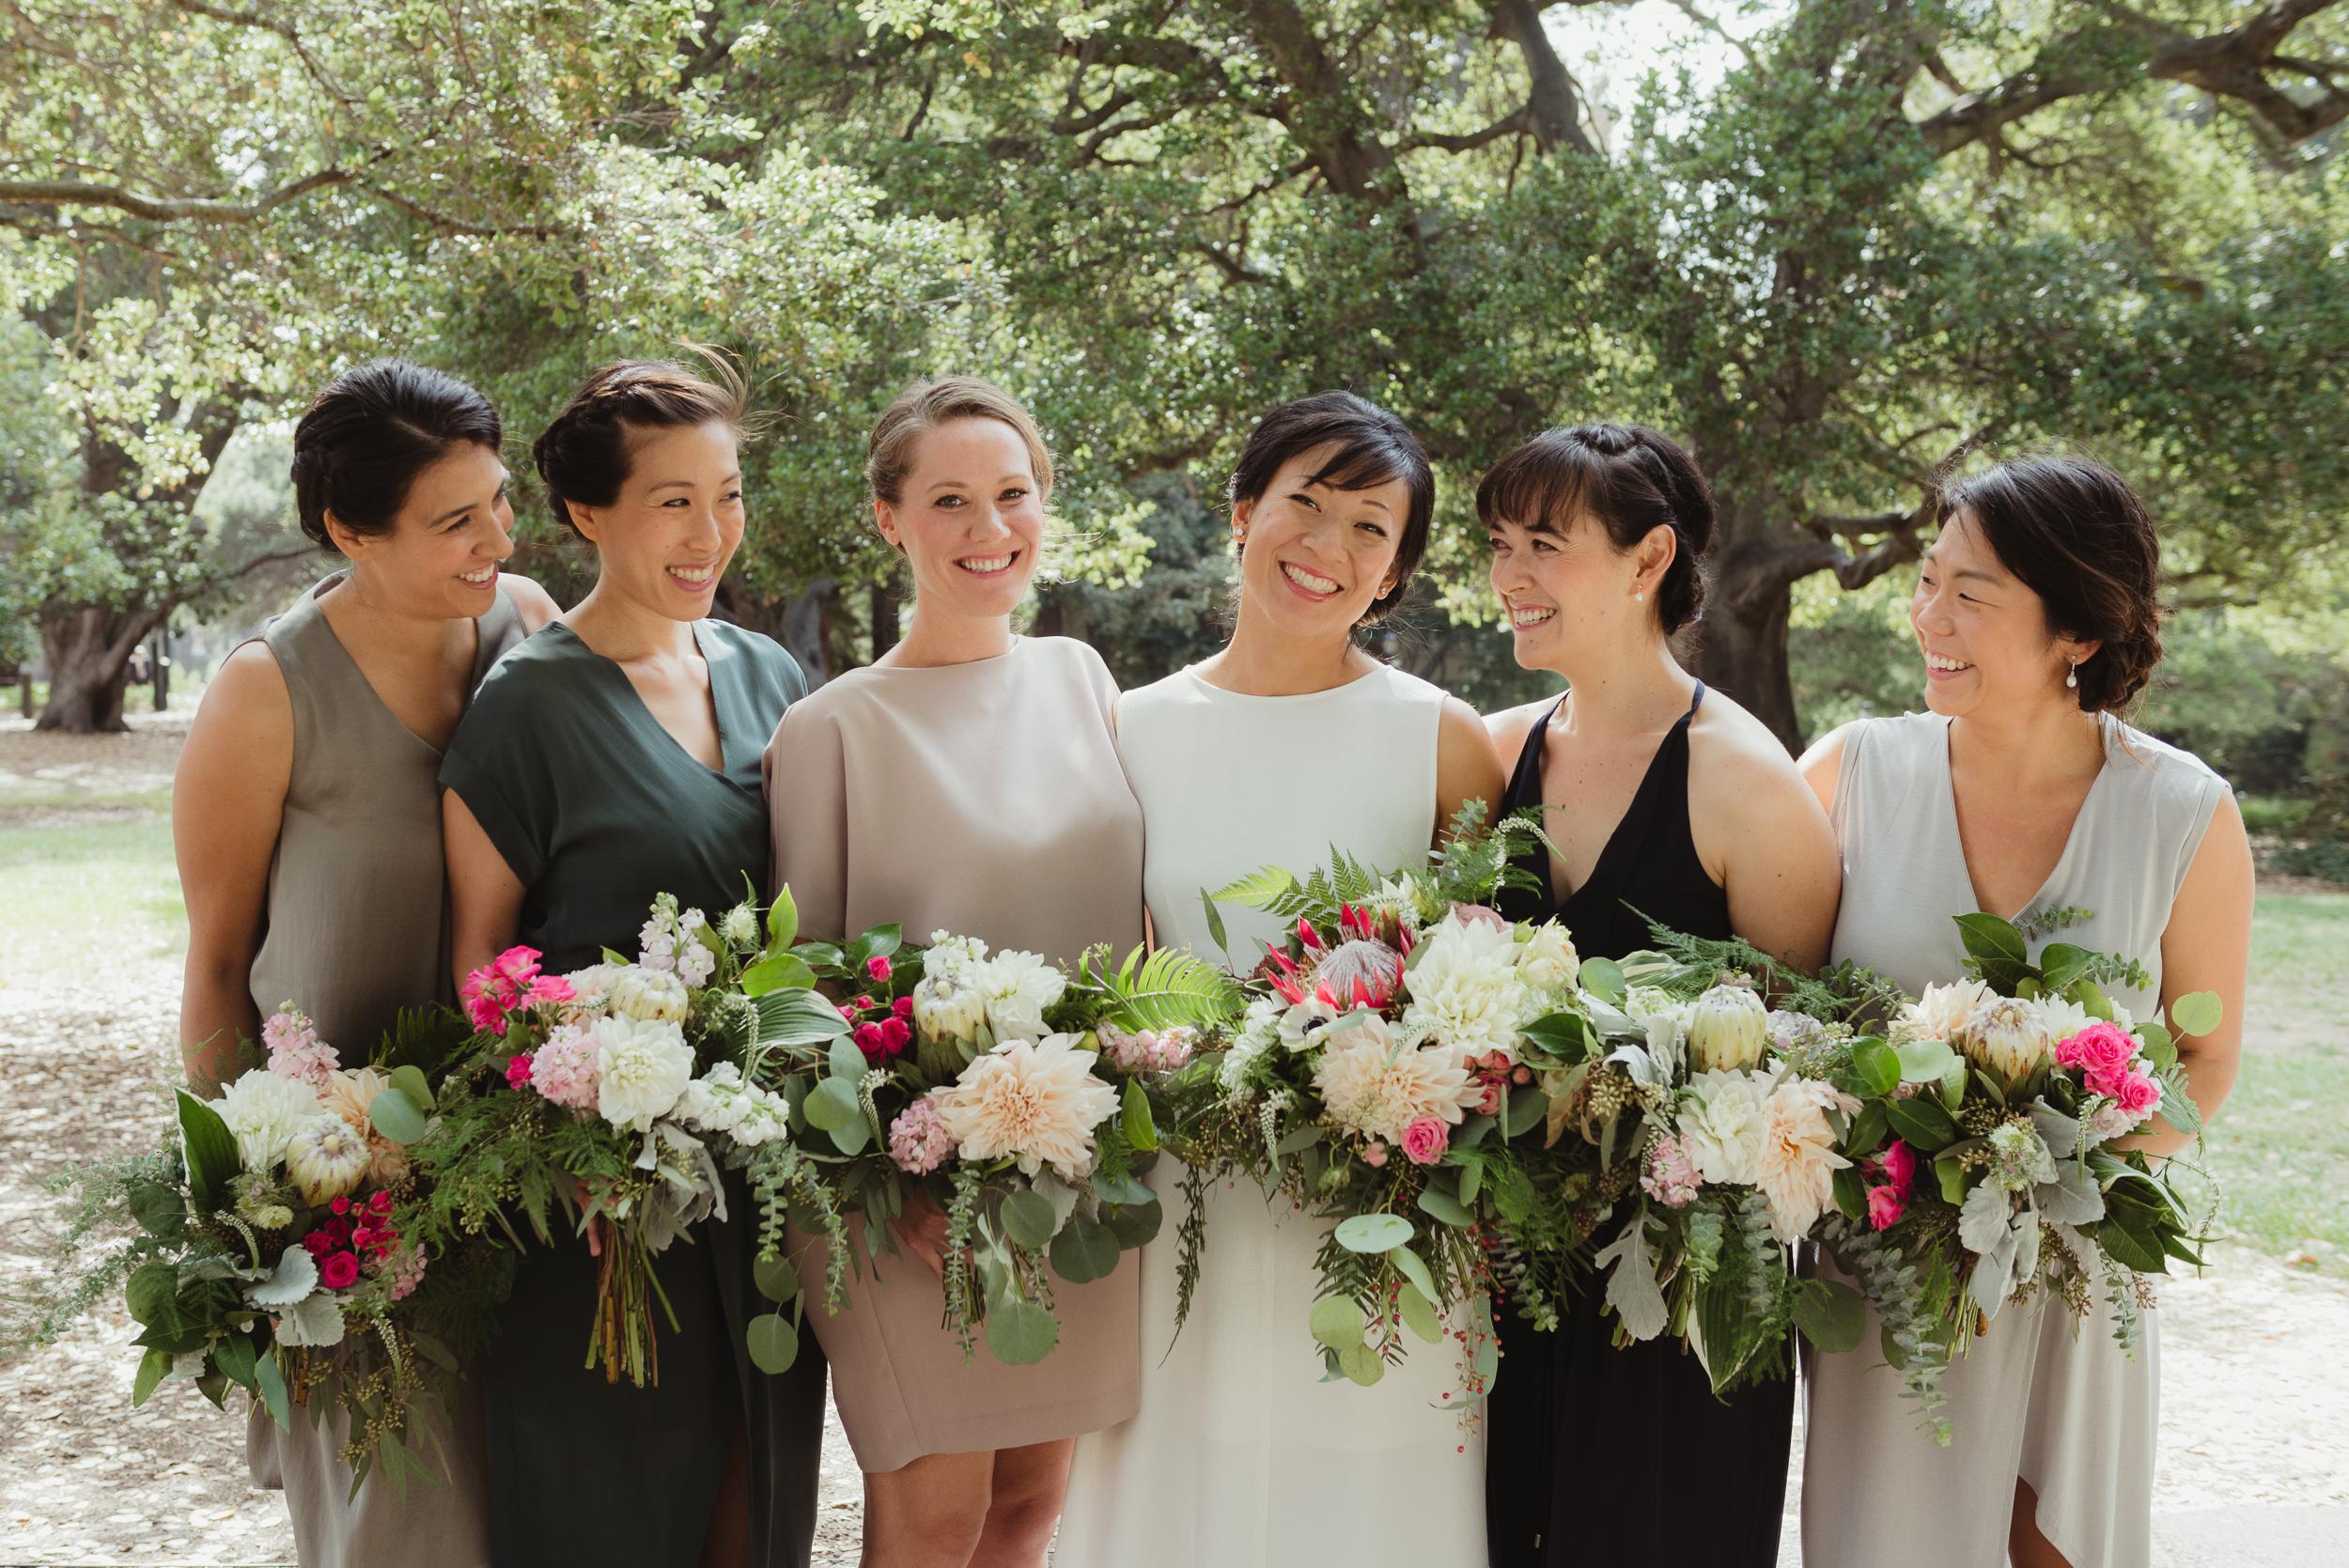 faculty-club-berkeley-wedding-photographer-vc012.jpg